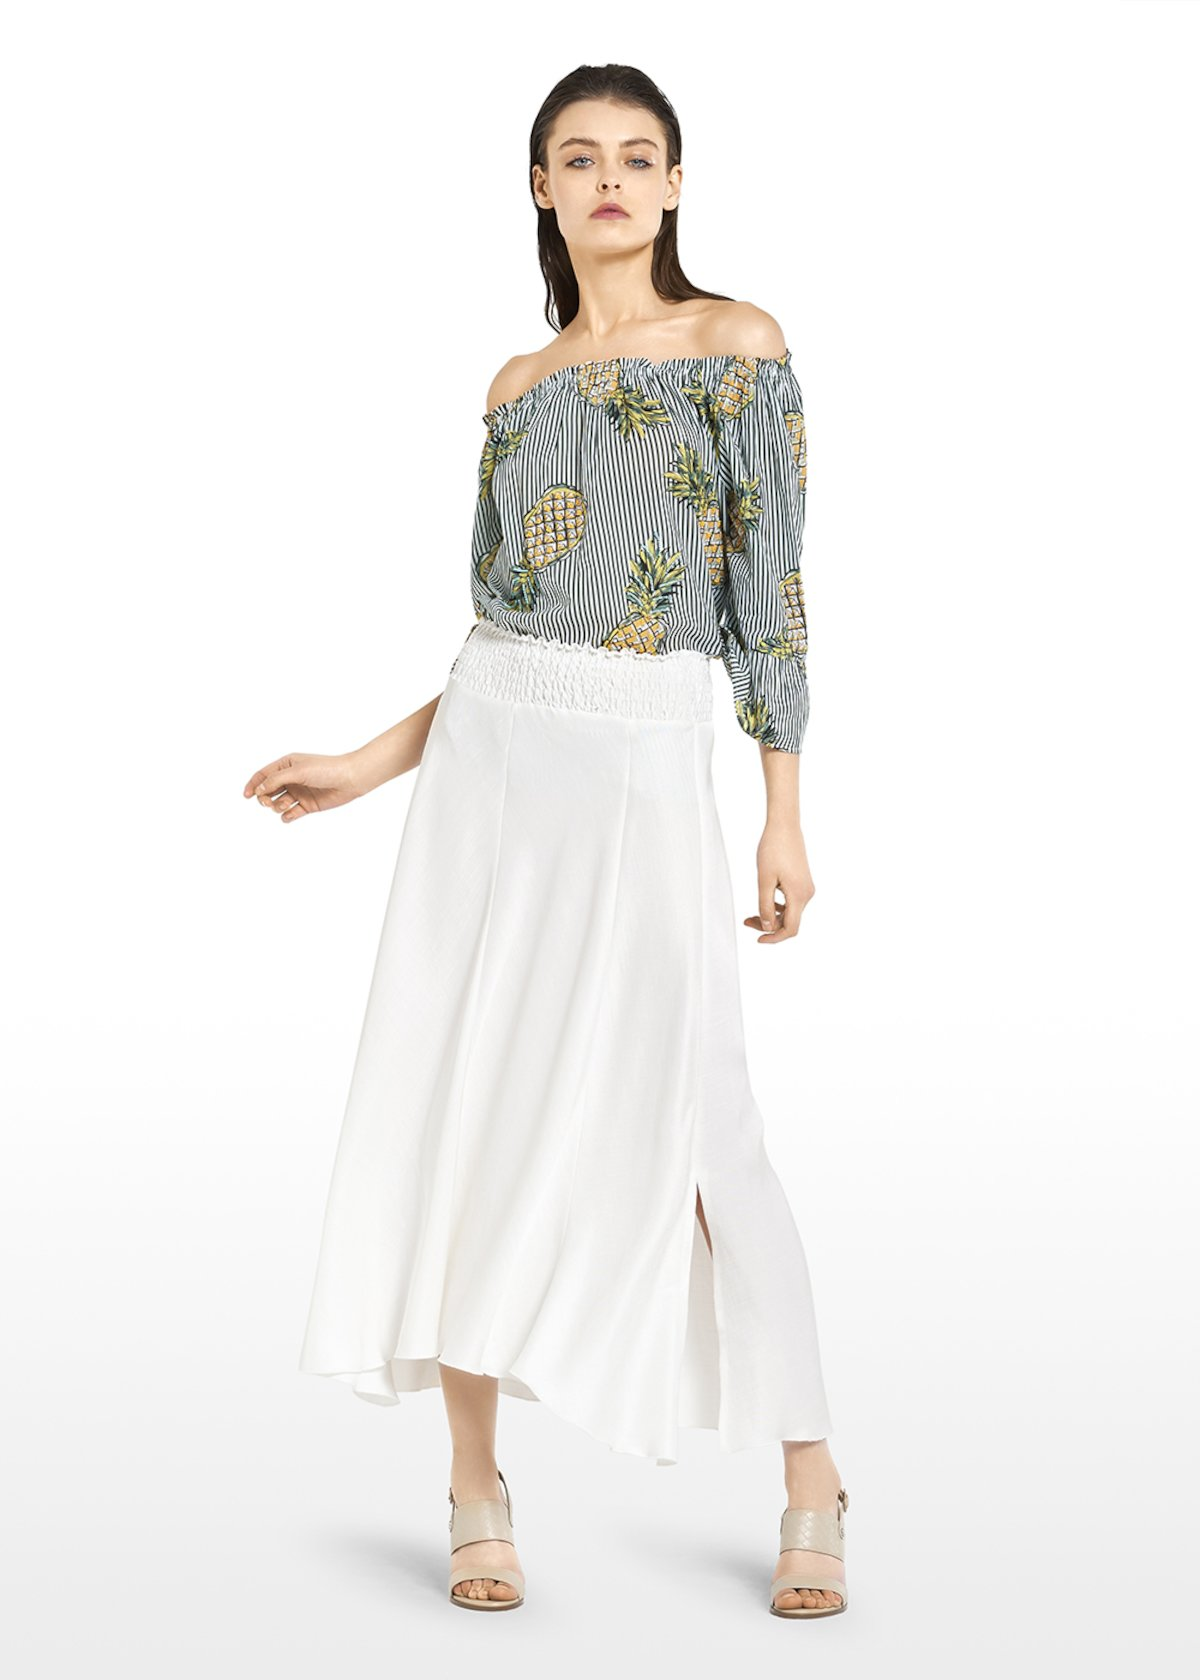 Chyla blouse with smock stitching at the neckline - White\ Amazon\ Fantasia - Woman